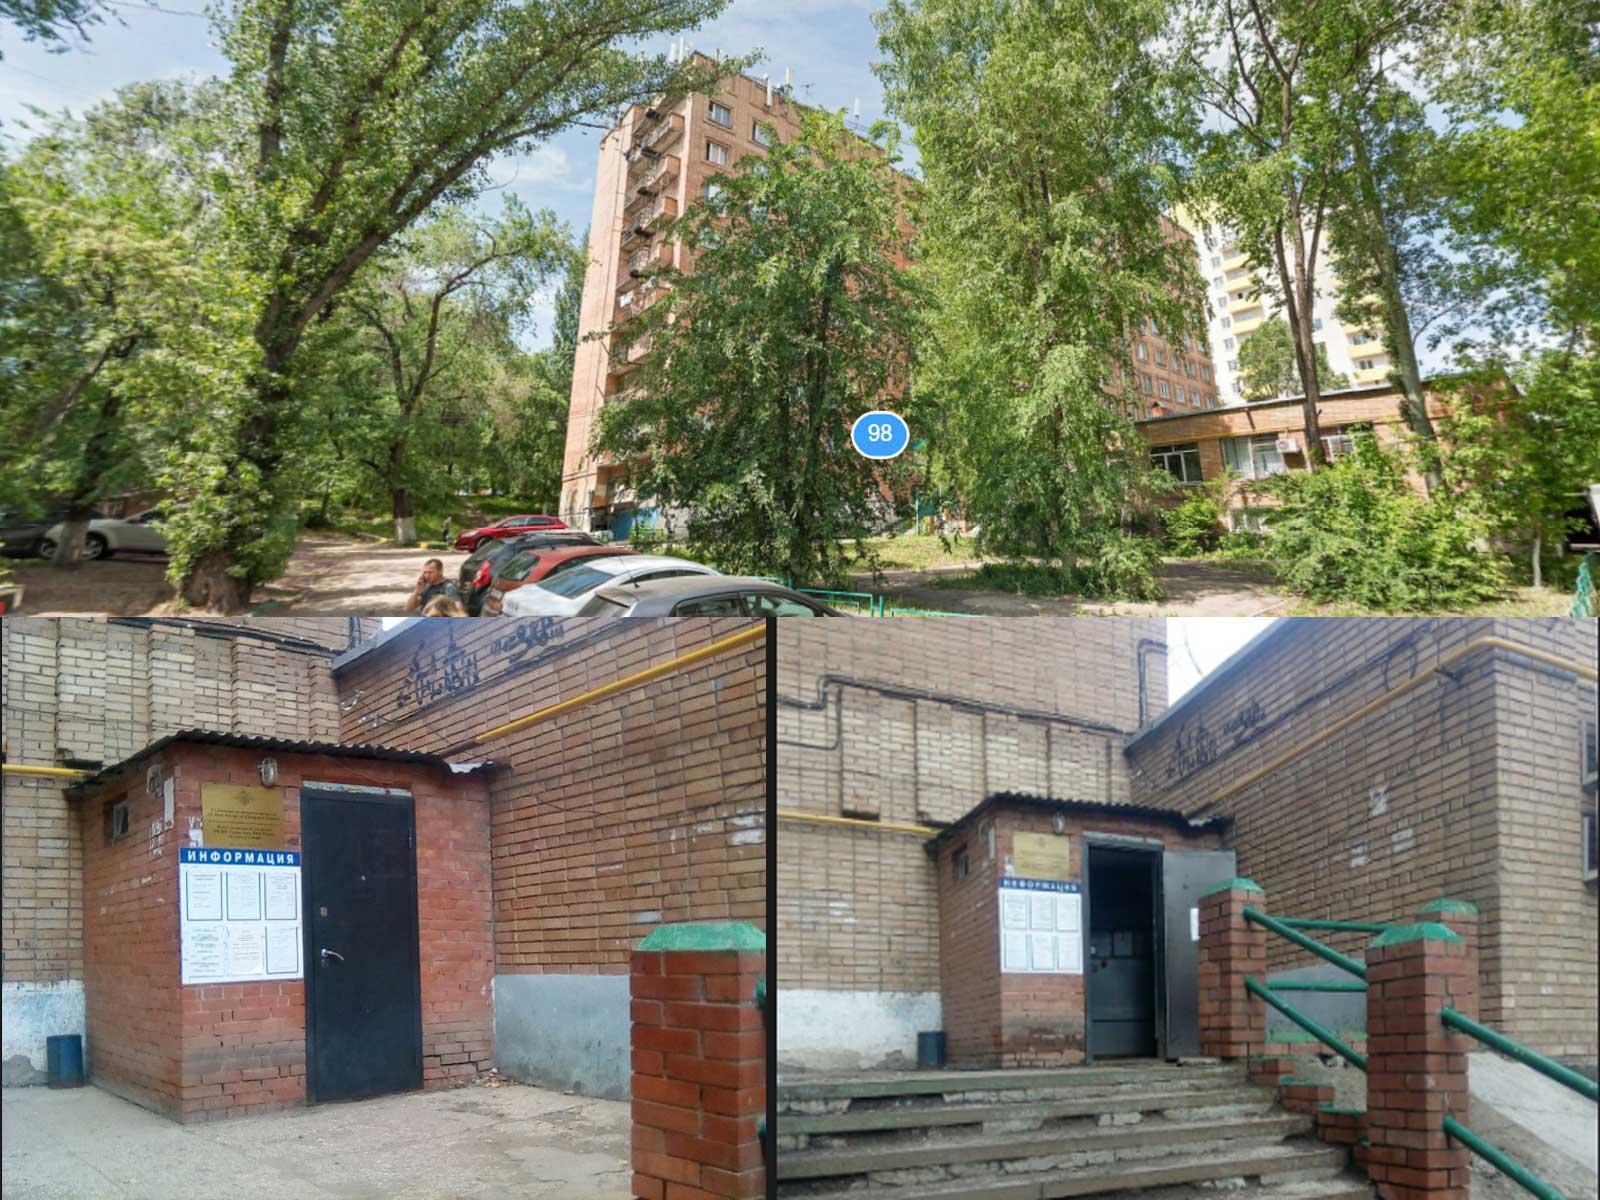 Вид на здание УФМС по Советскому району, Самара